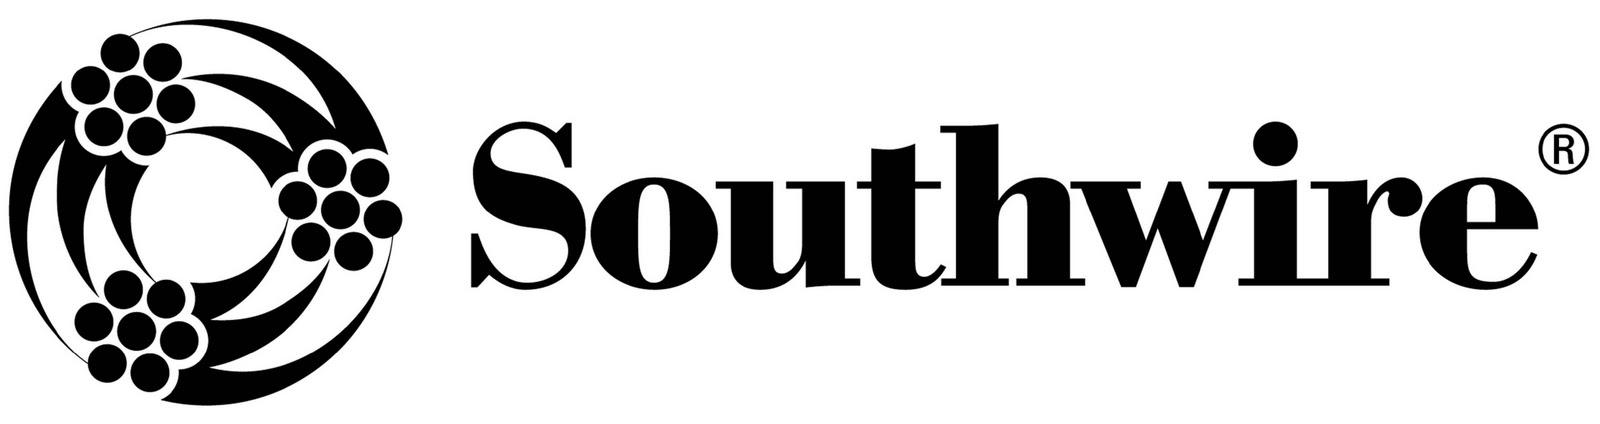 Luxury Southwire Company Logo Image - Wiring Diagram Ideas ...